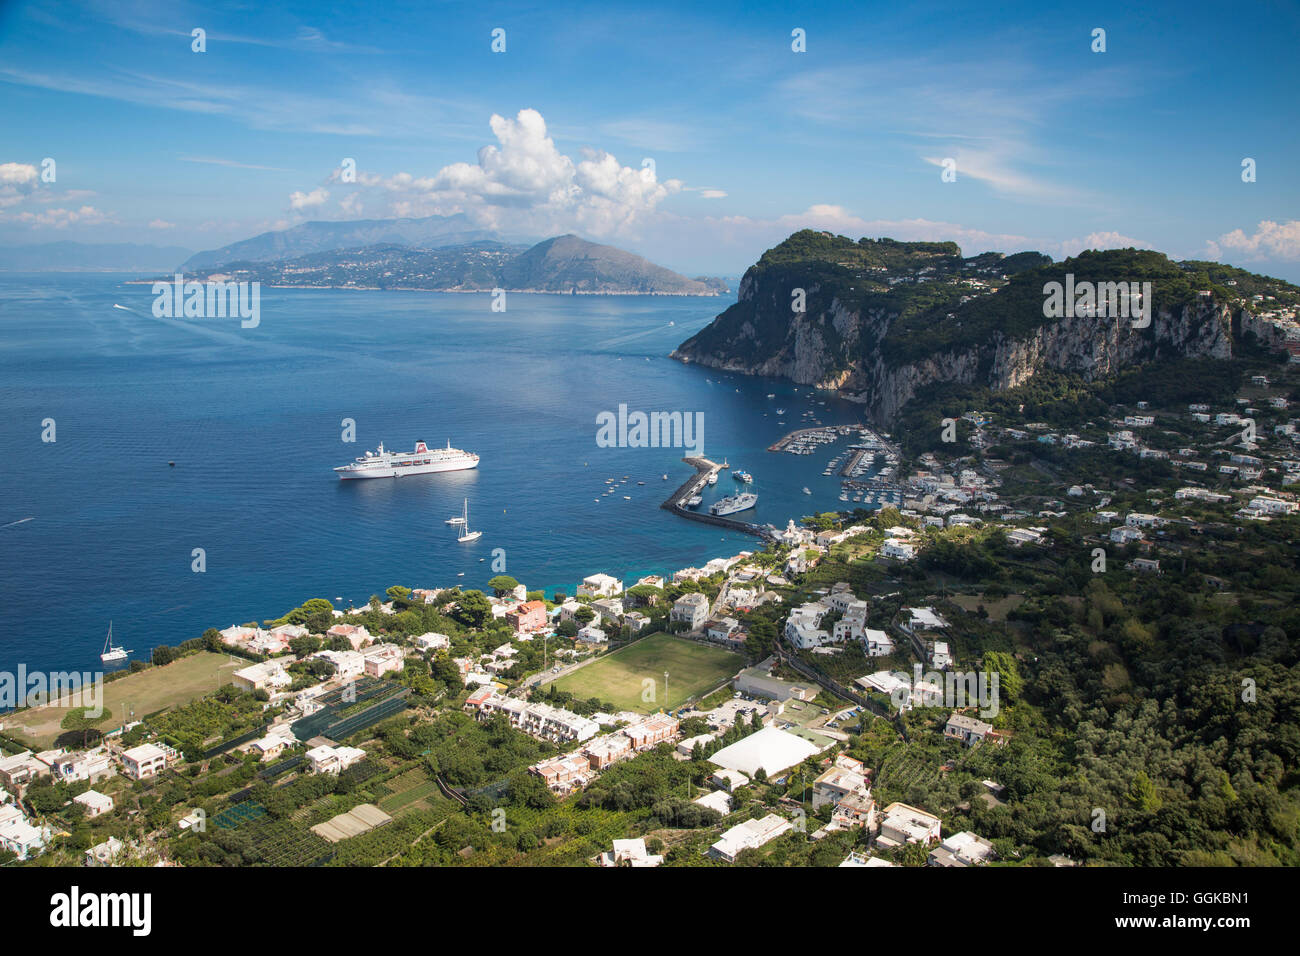 Cruise ship MS Deutschland (Reederei Peter Deilmann) at anchor in harbour, Isola di Capri, Campania, Italy - Stock Image